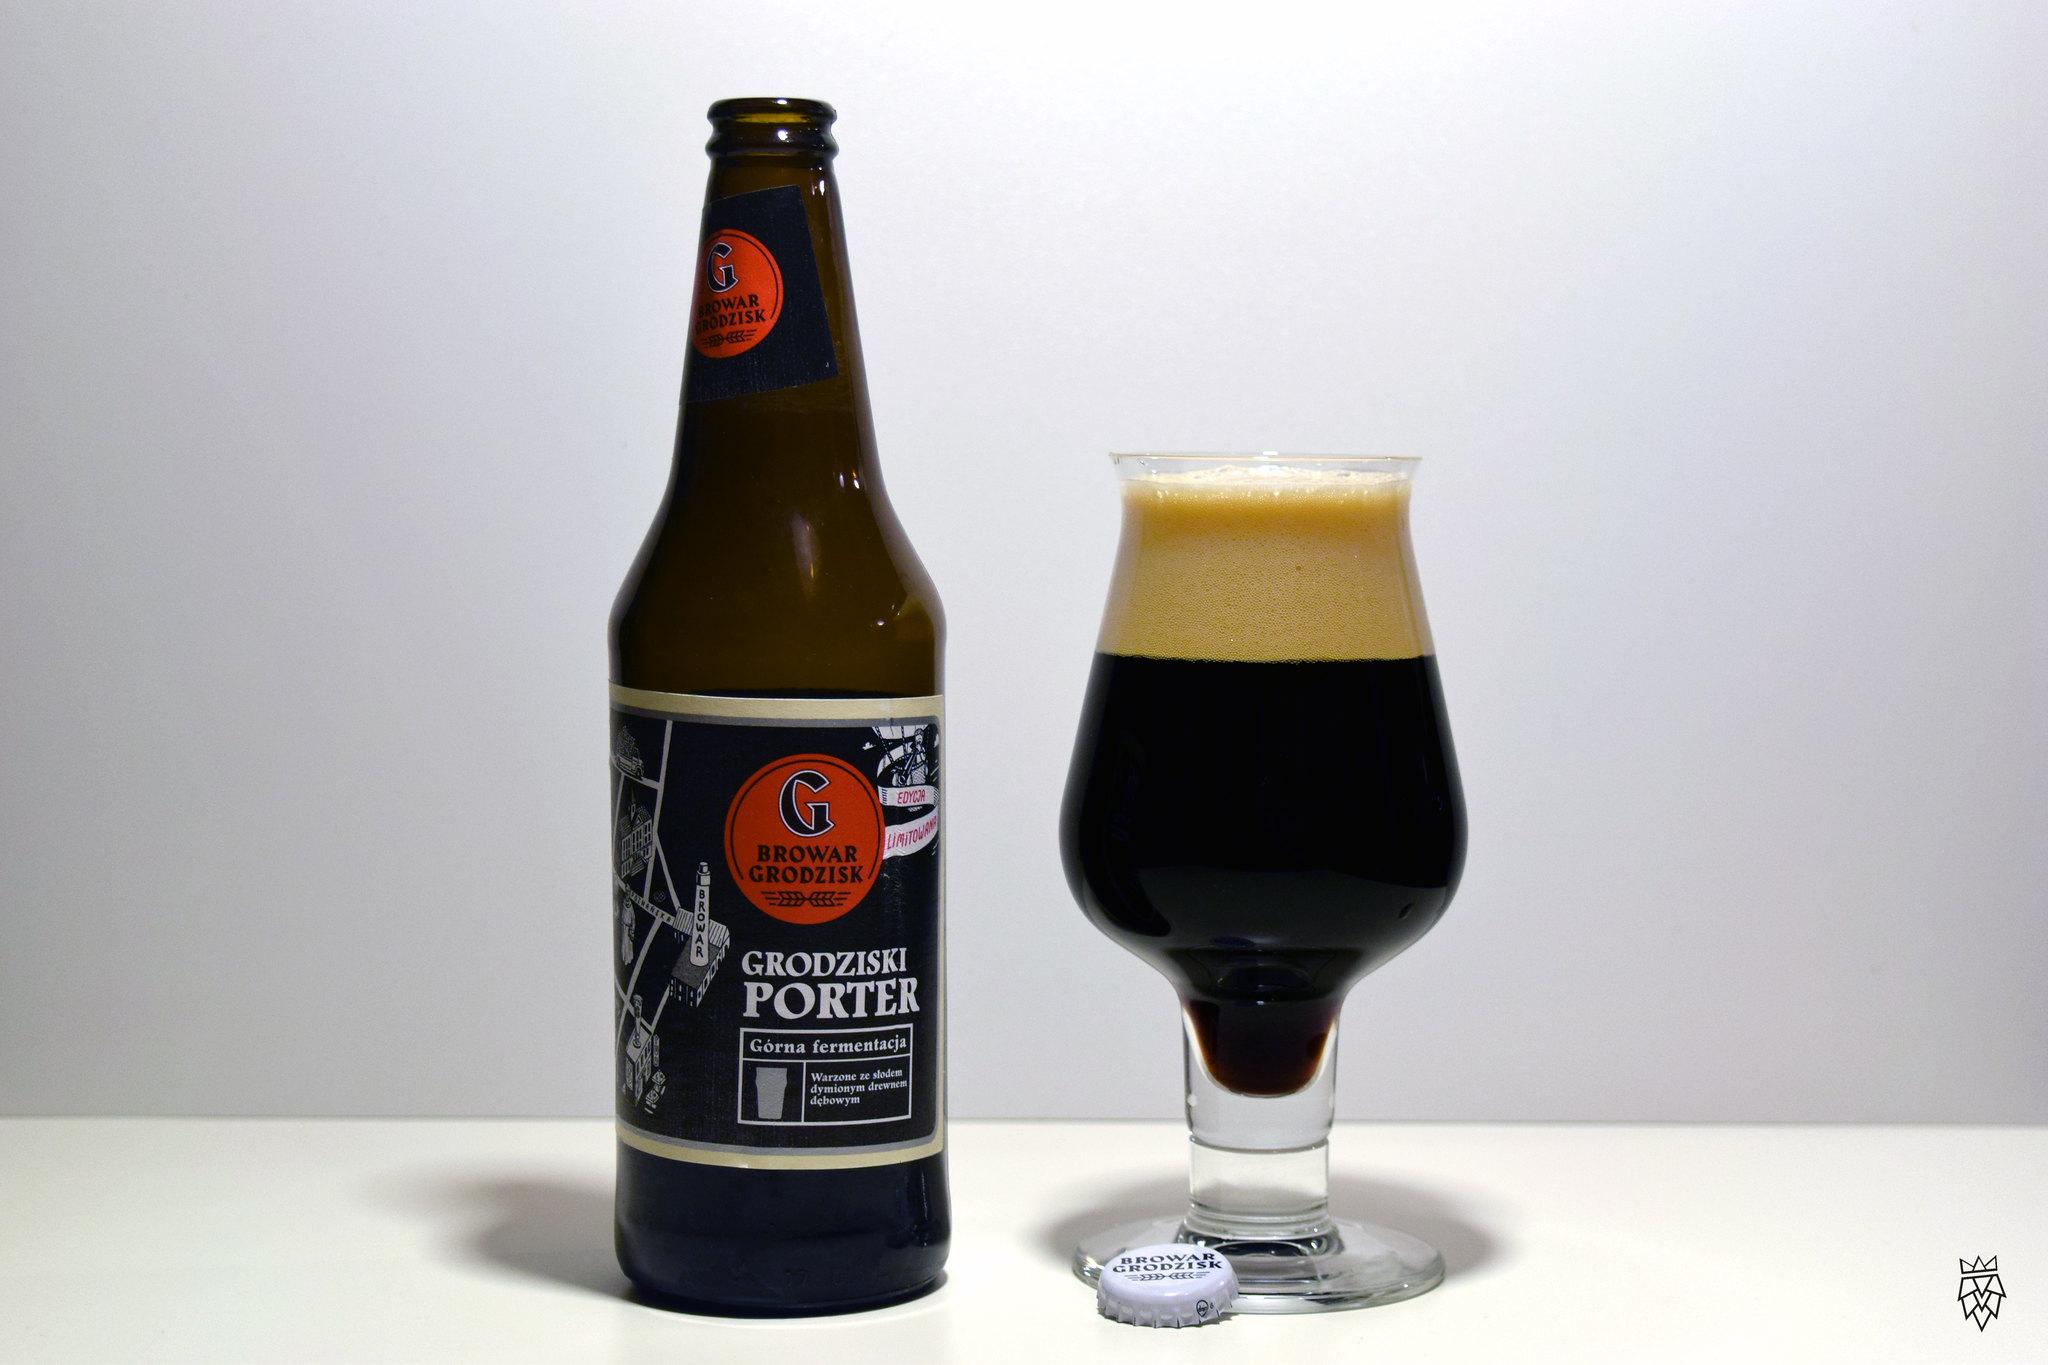 Porter Grodziski